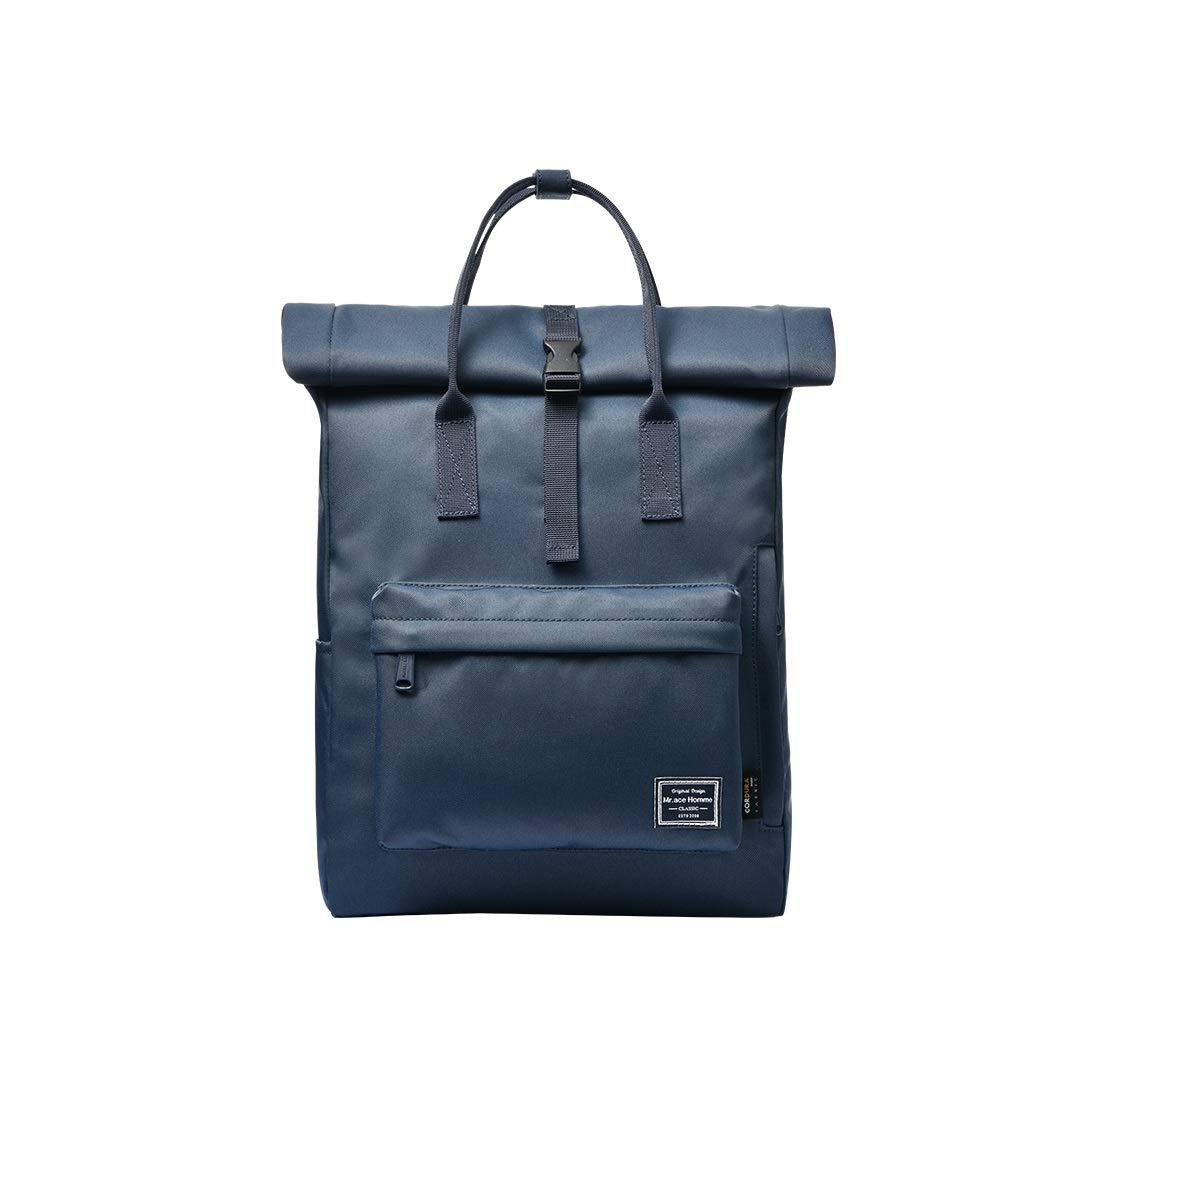 4 M KUQIQI Solid color School Bag, Male And Female College Backpack Waterproof Travel Backpack Practical school bag